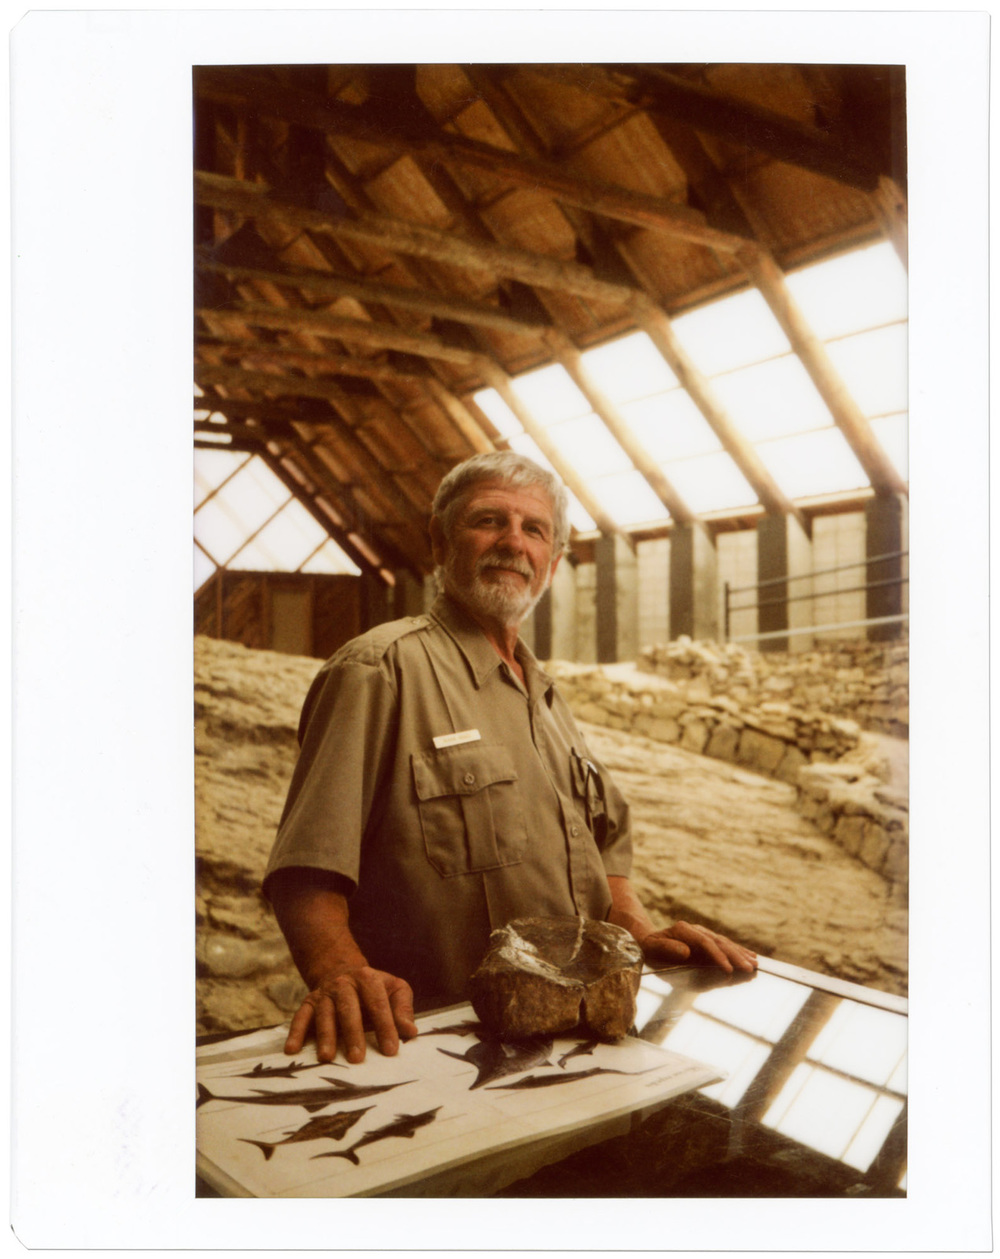 Ranger Robin Riggs, Berlin-Ichthyosaur State Park, Nevada